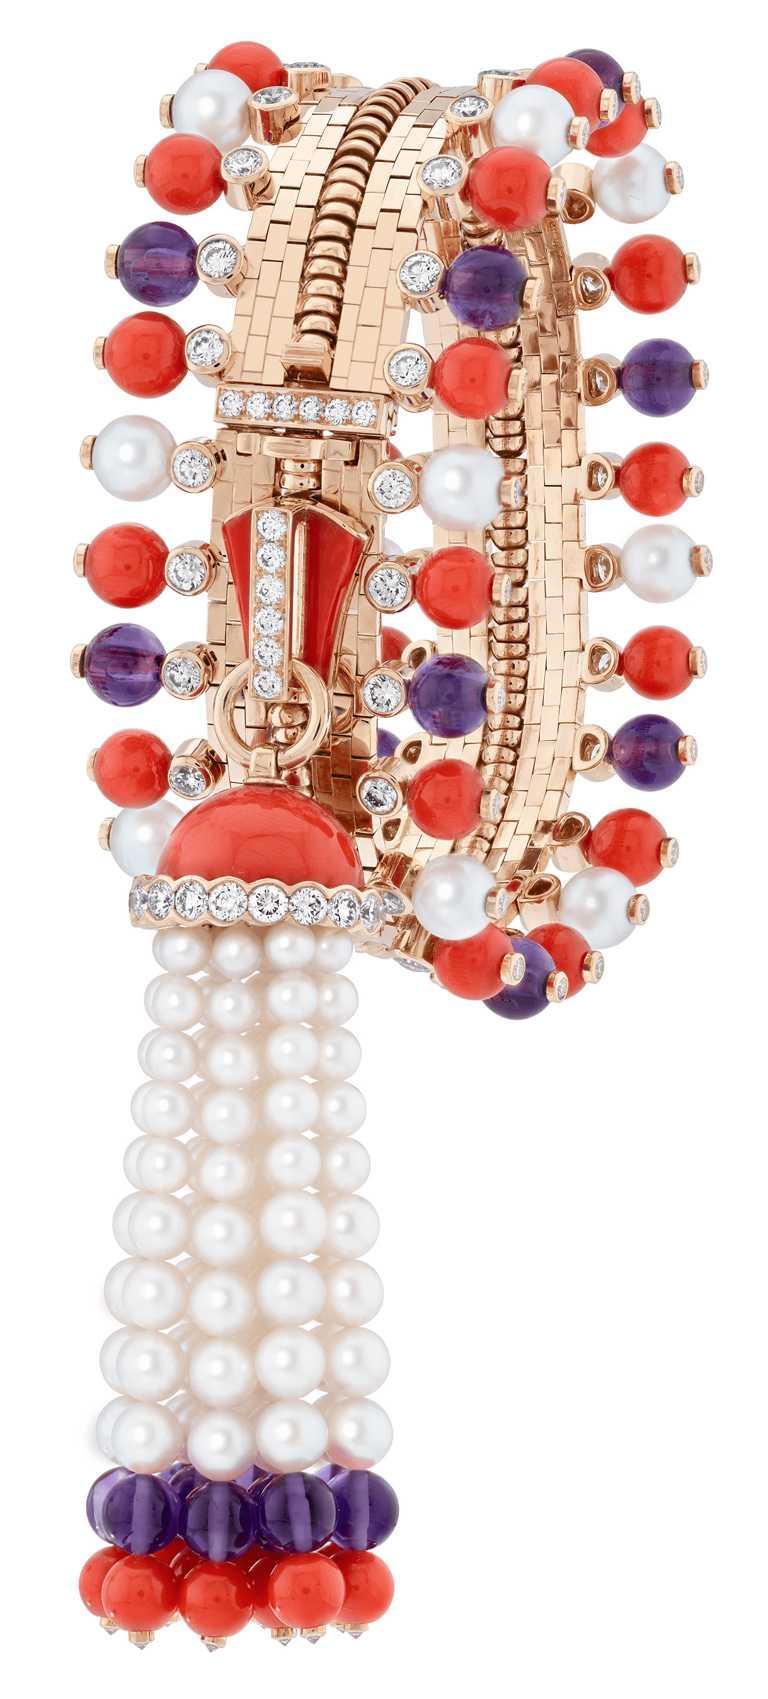 Van Cleef & Arpels「Zip」系列,Zip Antique Couleur項鍊轉換為手鍊,玫瑰金、珊瑚、紫水晶、白色養殖珍珠、白色珍珠母貝及鑽石╱13,900,000元。(圖╱Van Cleef & Arpels提供)